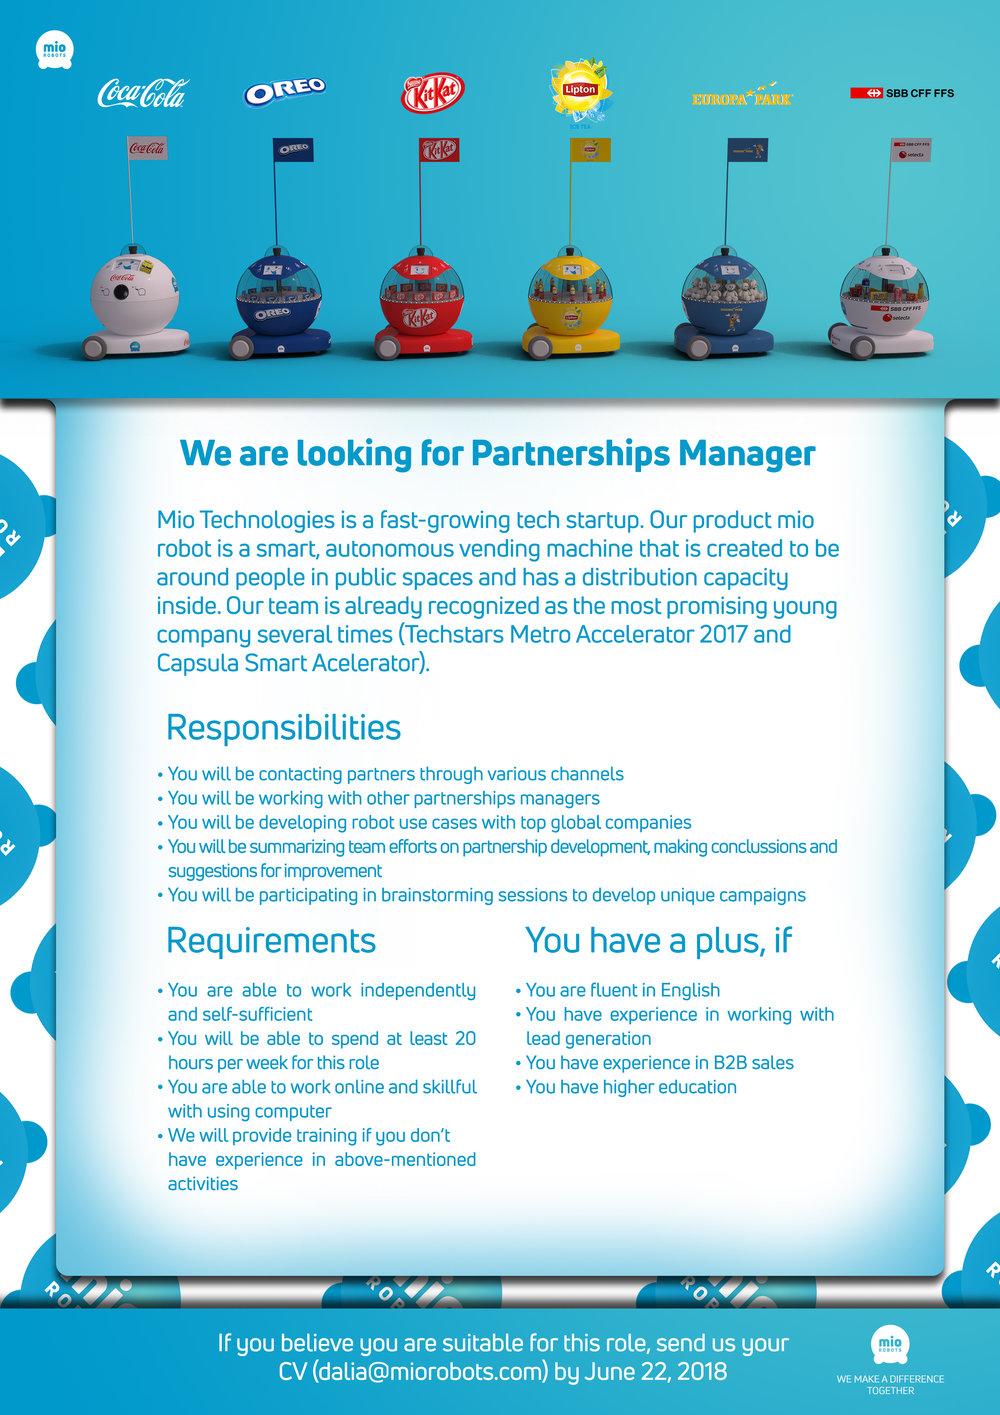 Partnerships Manager